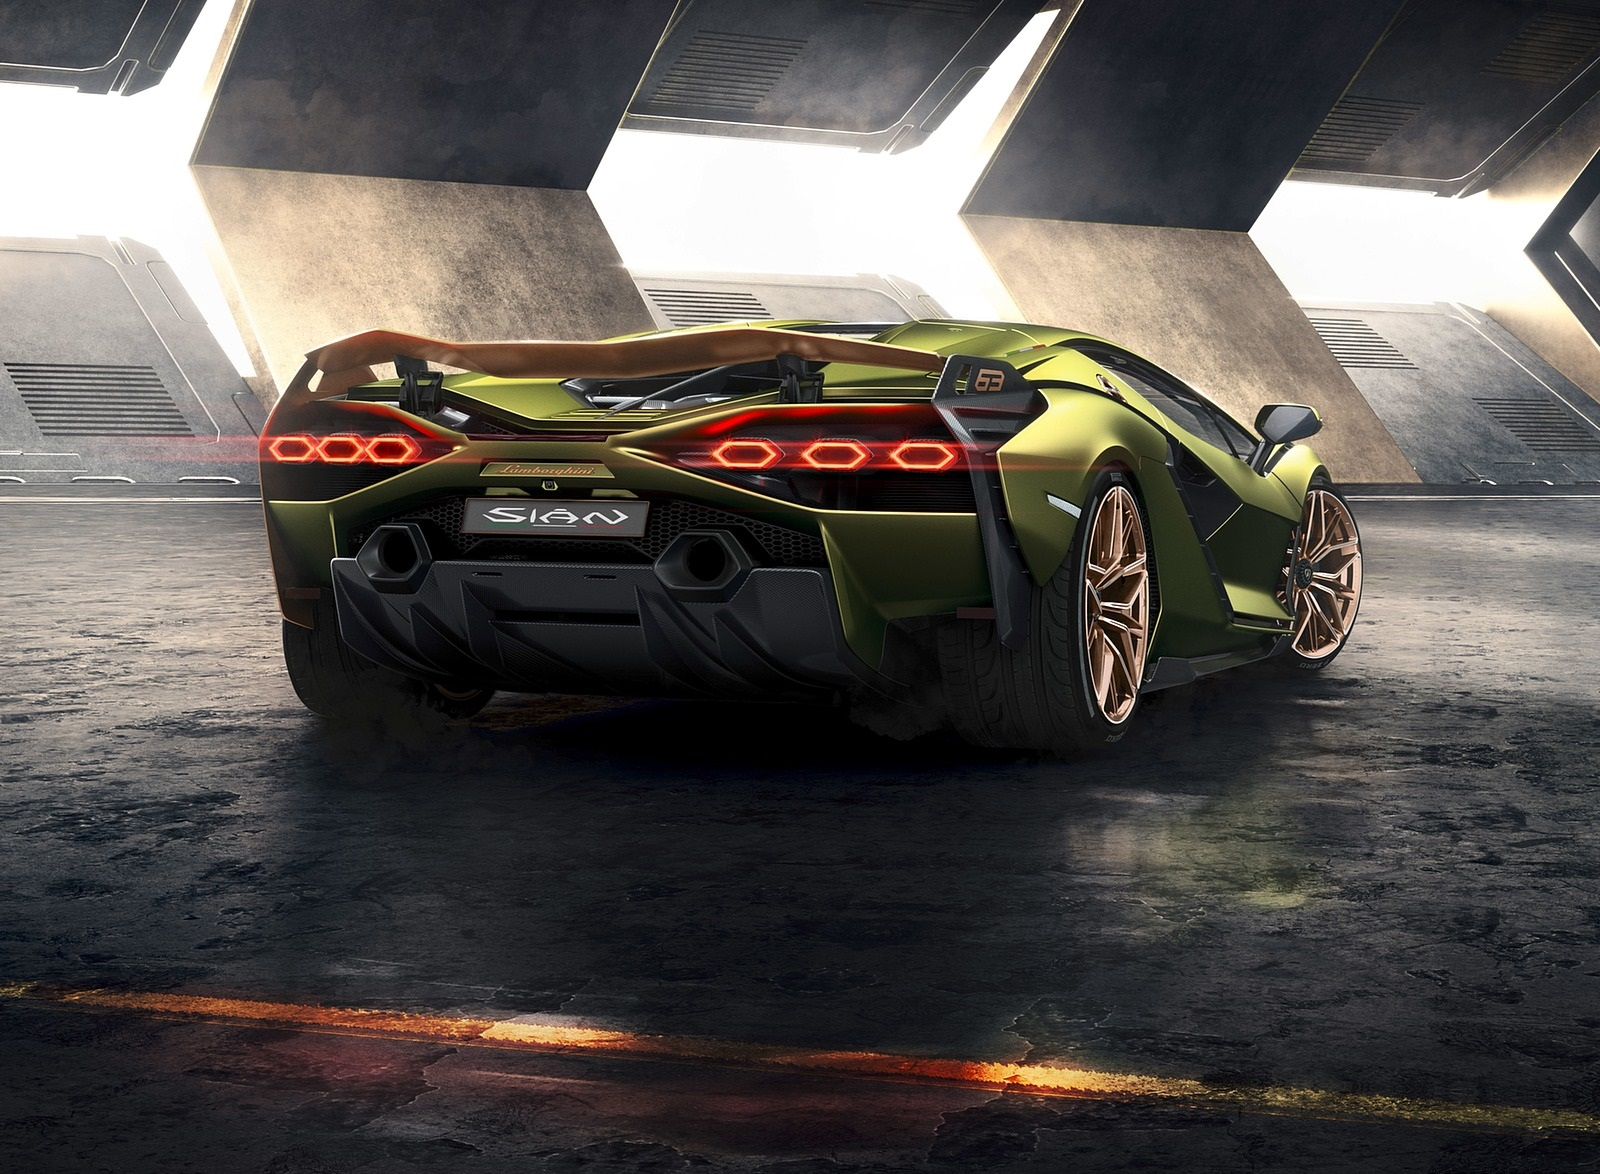 2020 Lamborghini Sián Rear Wallpapers (2)